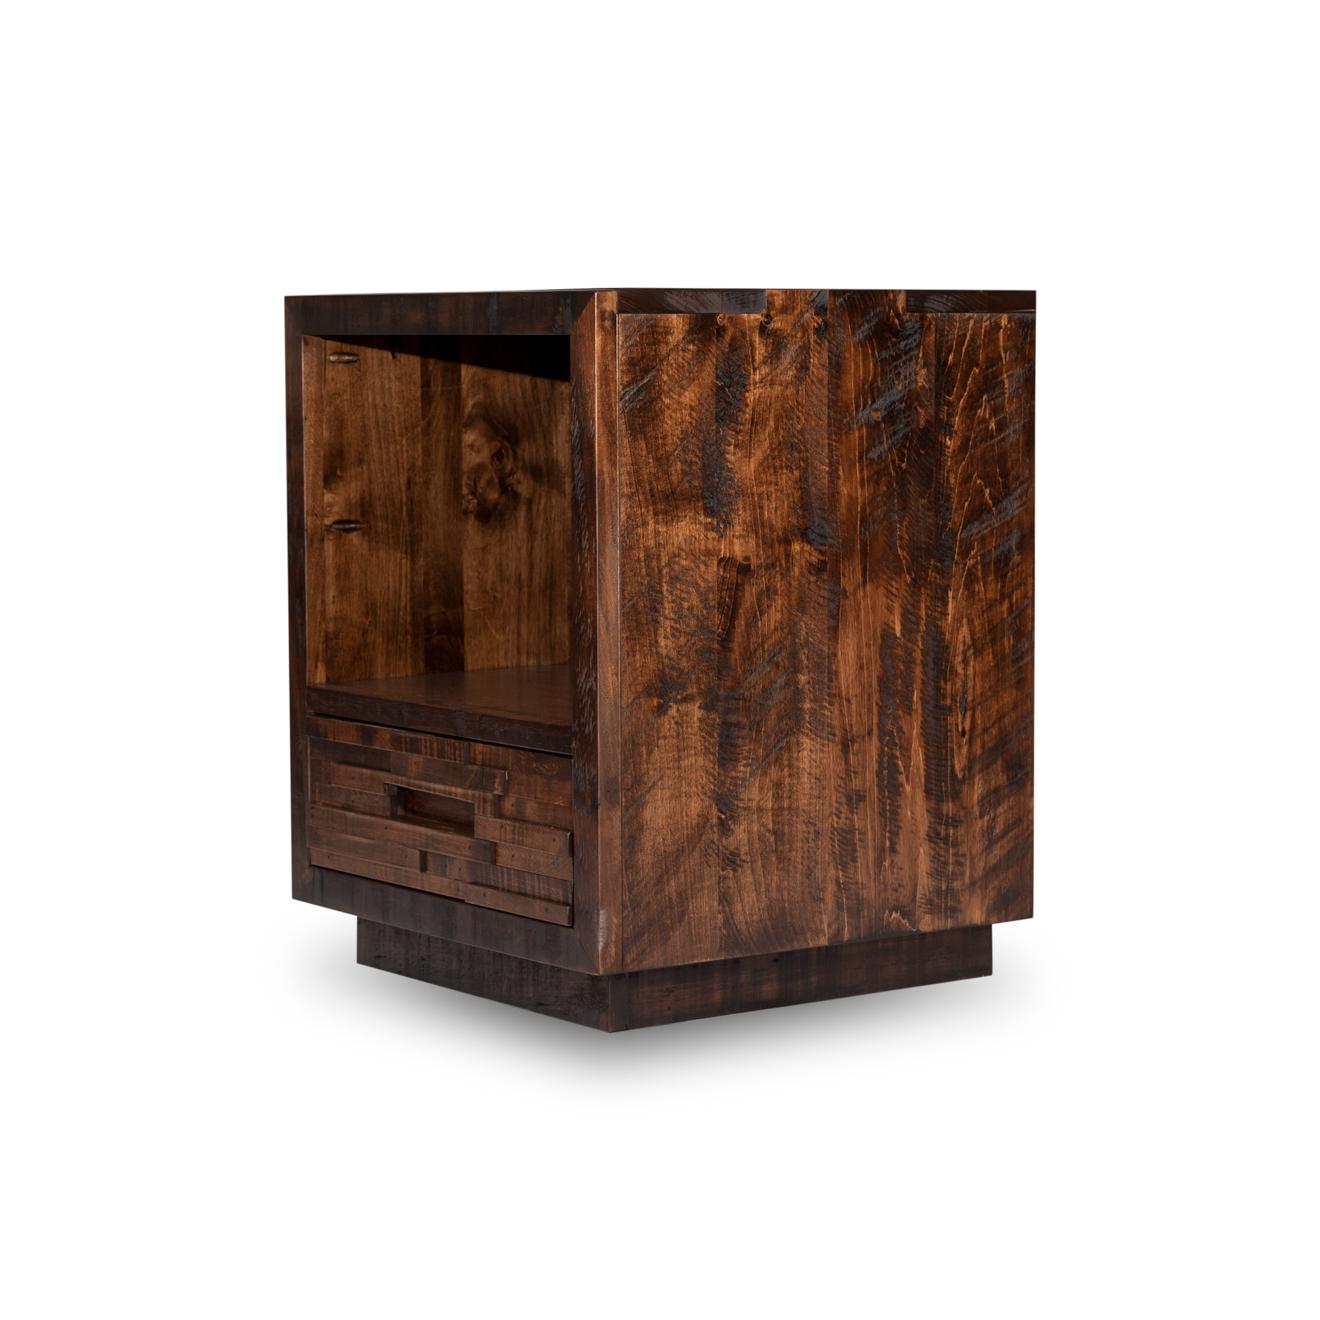 007_Woodcraft_Furniture_GreatLakesNightStand_QtrD-4.jpg